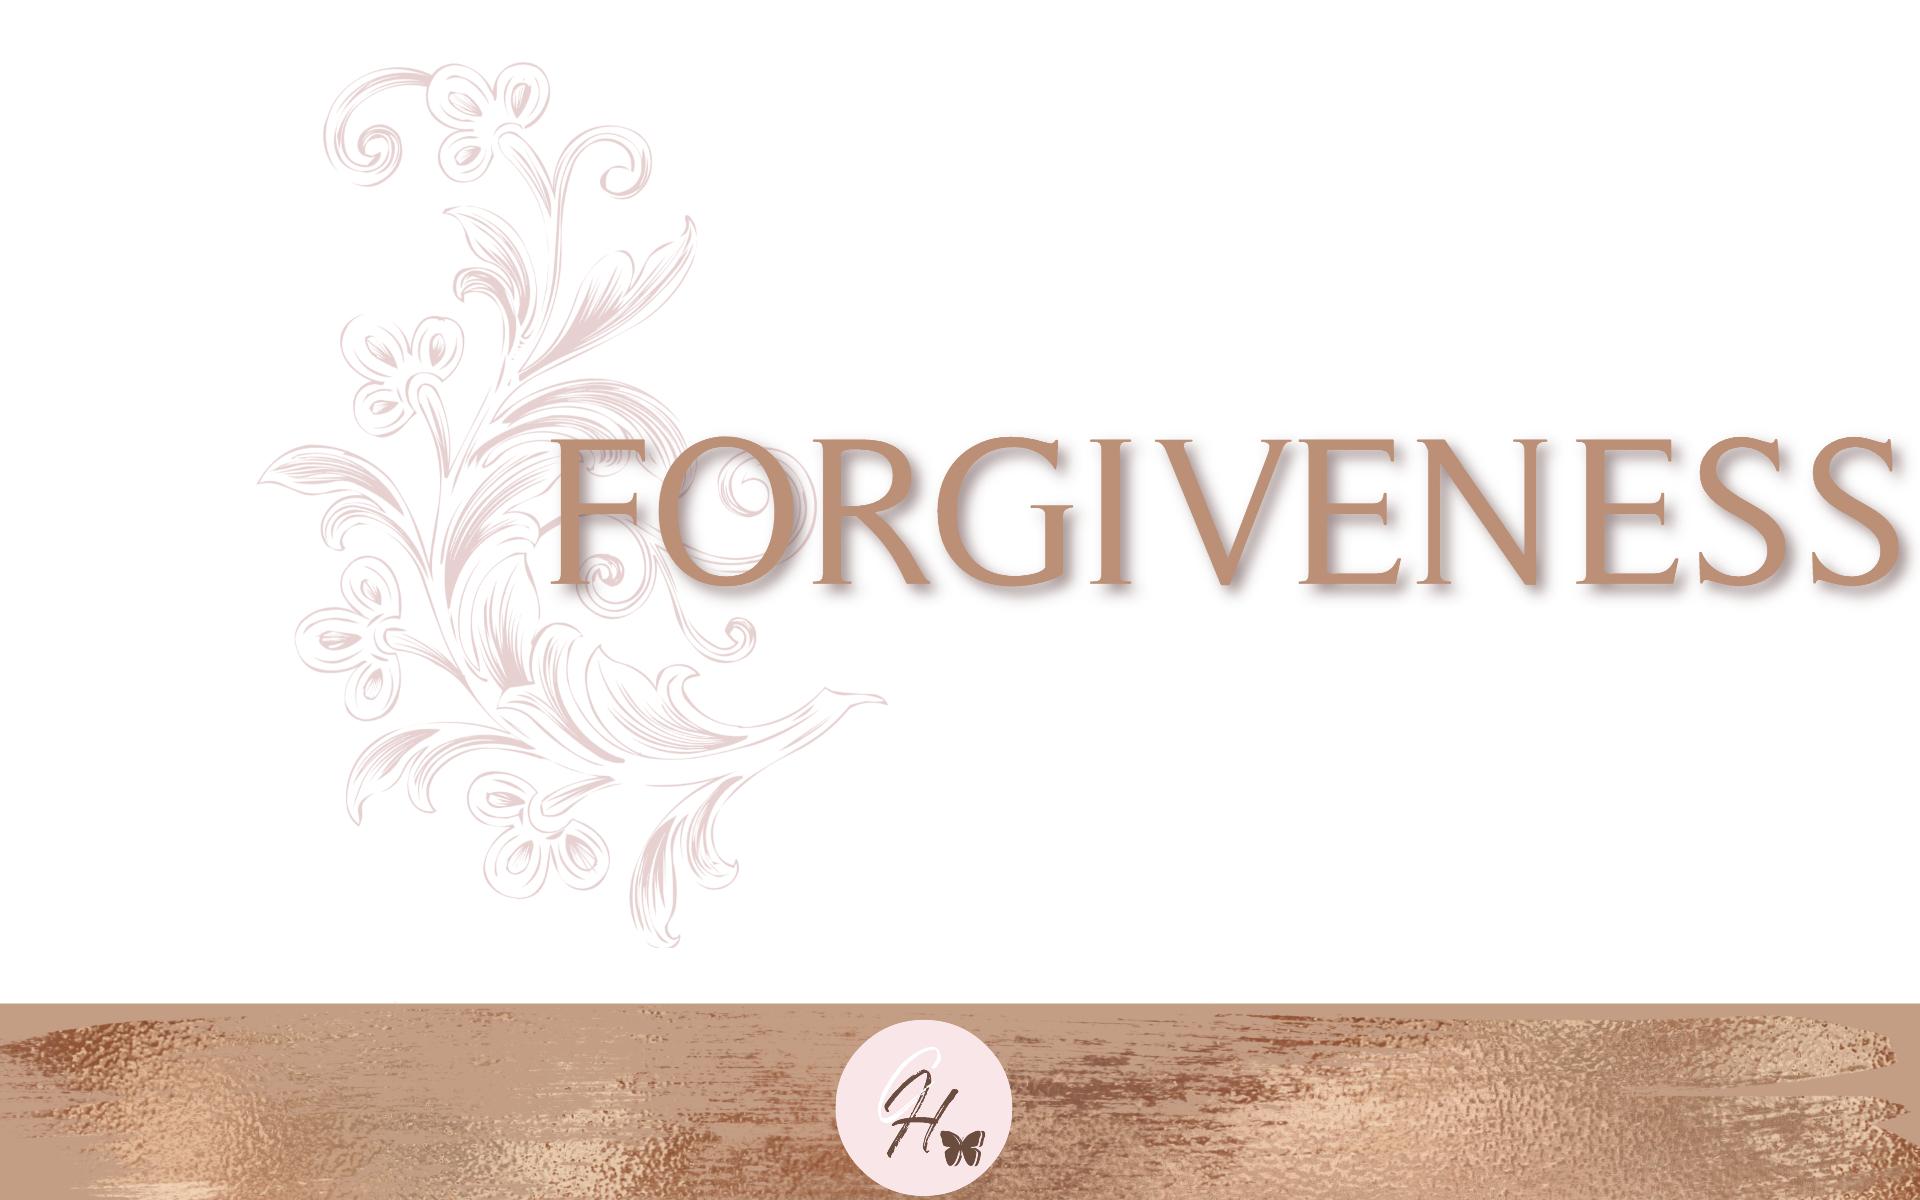 Forgiveness - Bible Study Guide